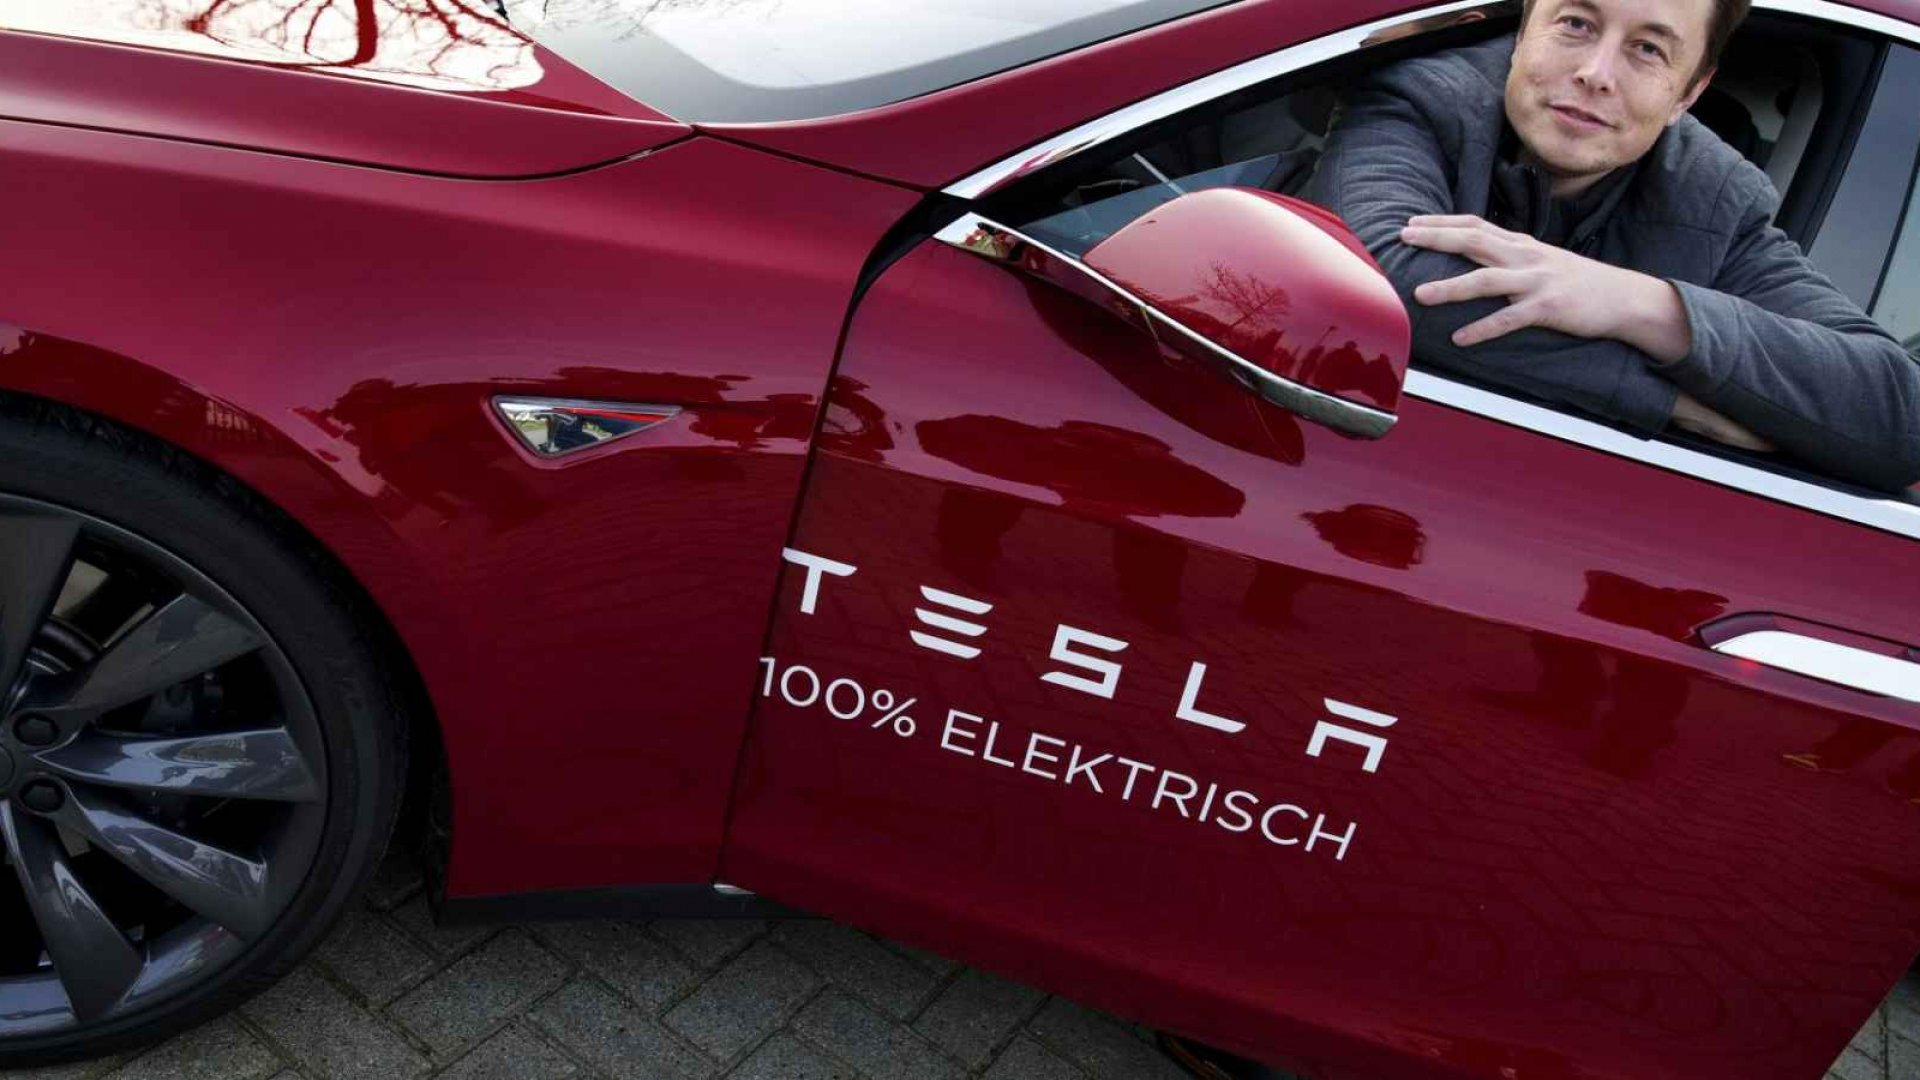 Elon Musk Accused of Being 'Innovation Killer'